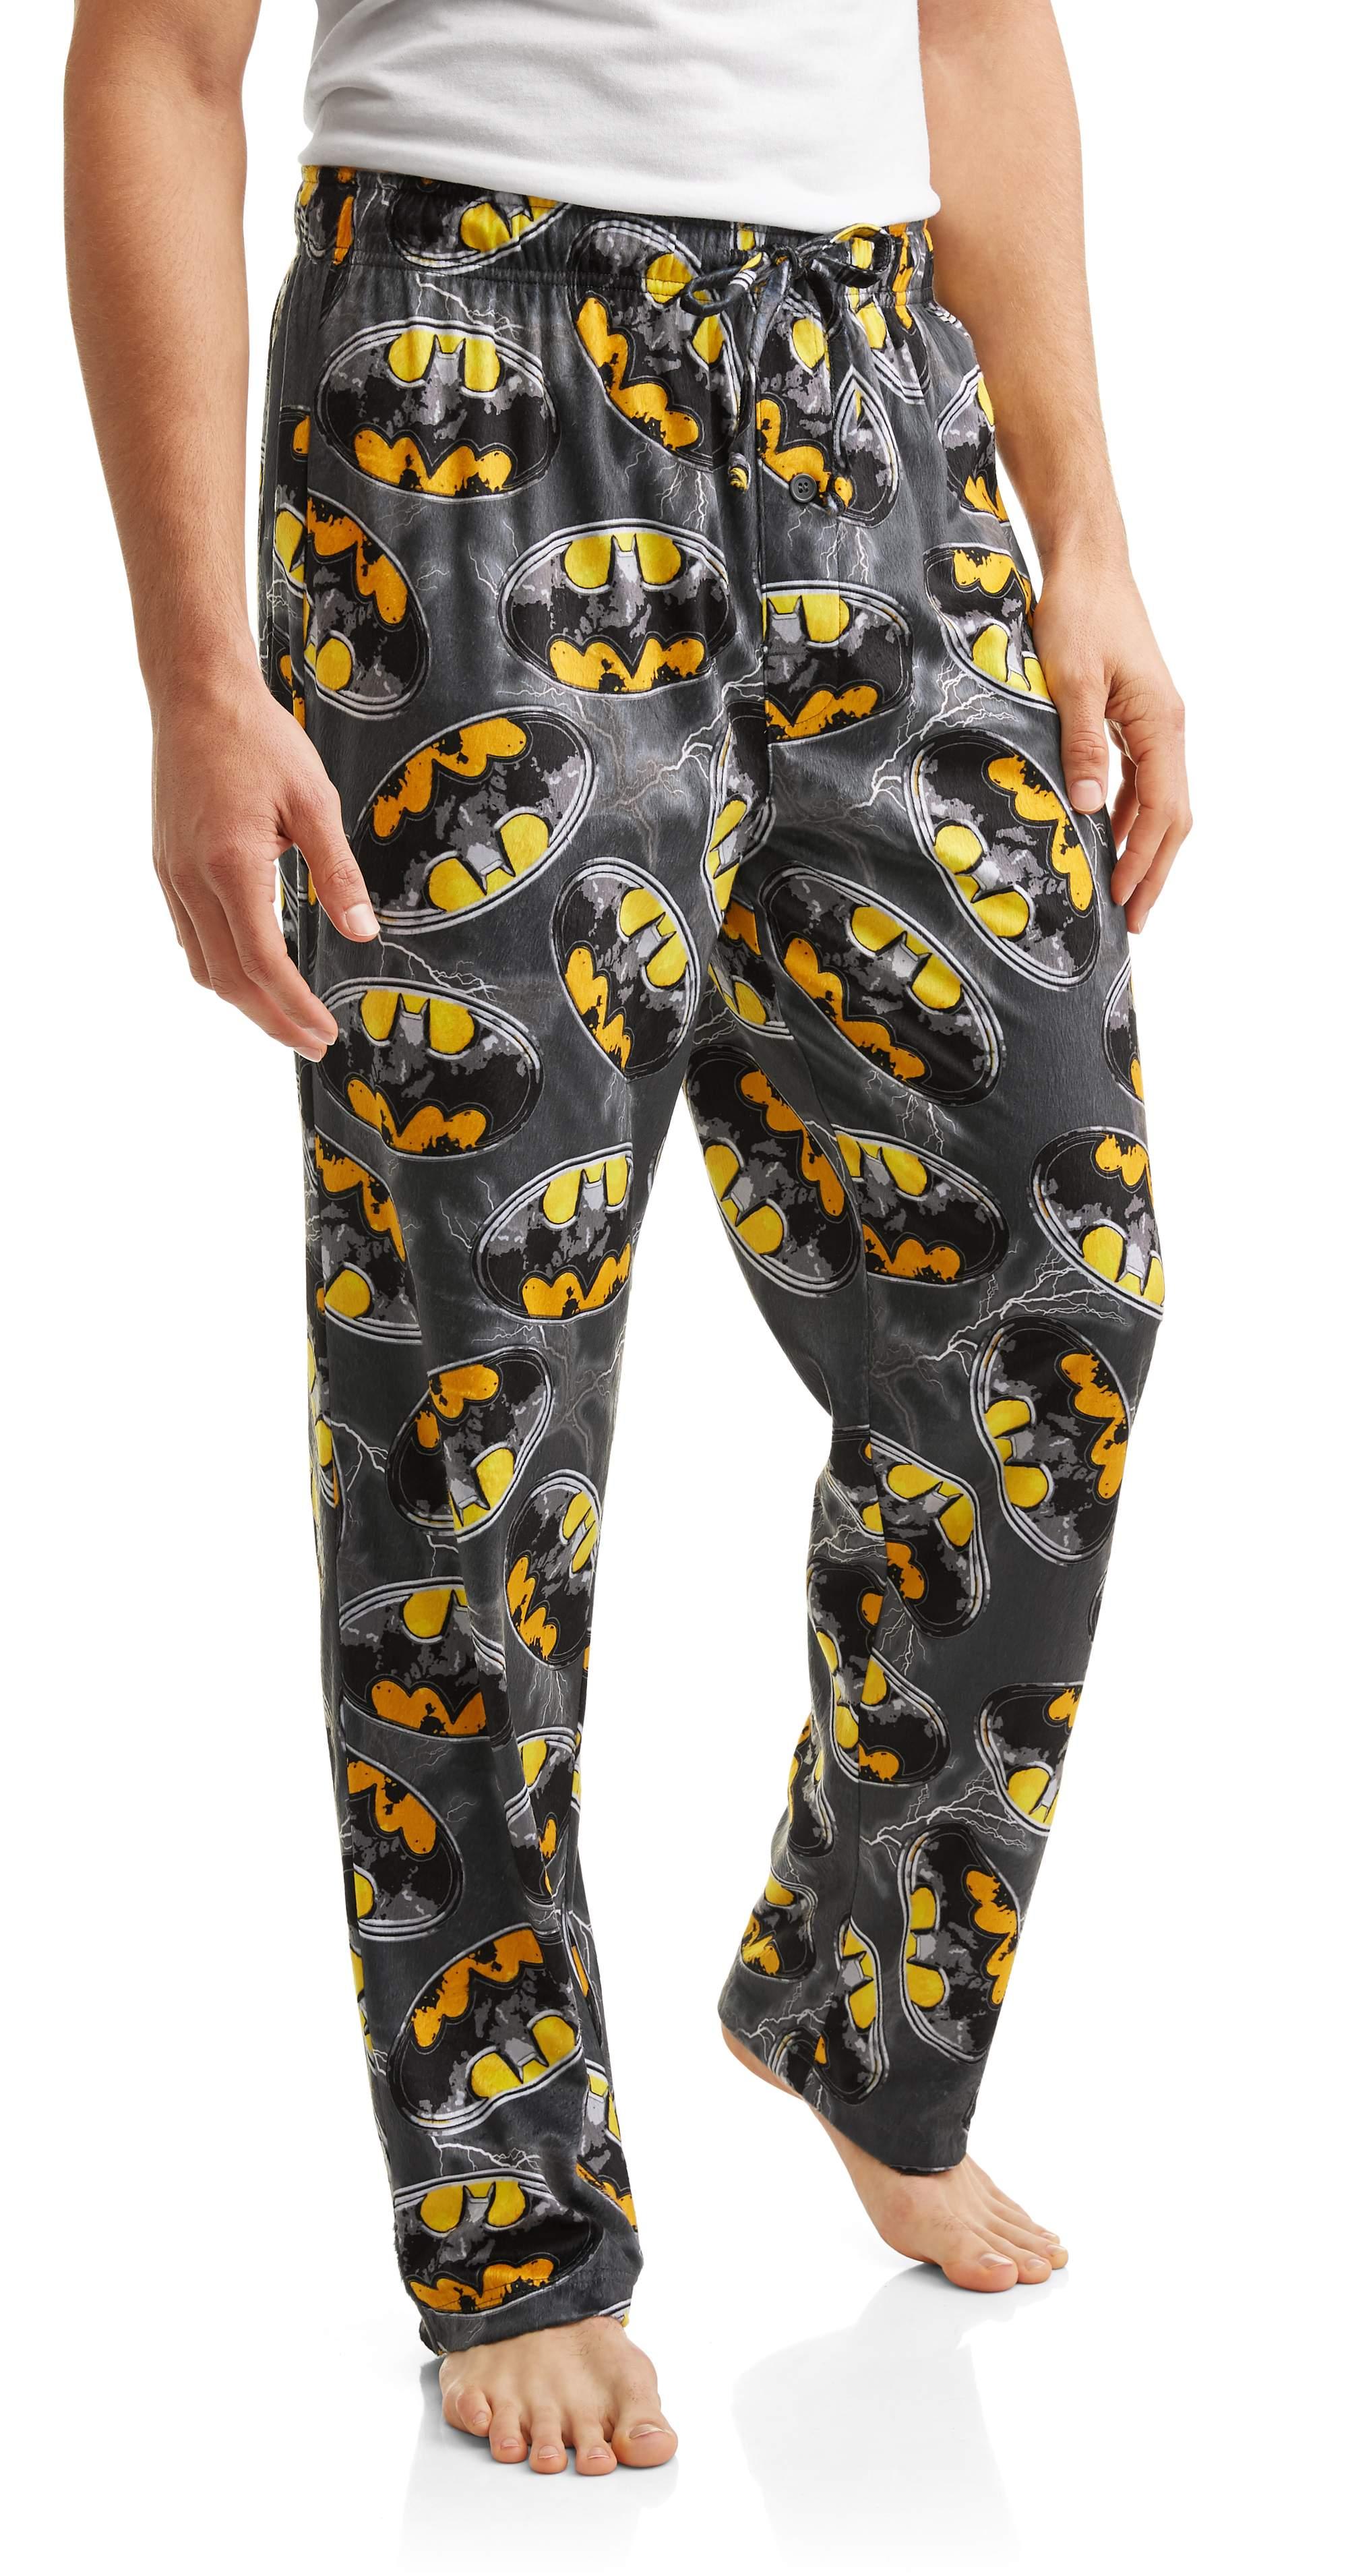 Batman Men's Minky Fleece Pants, Up to Size 2XL by Generic